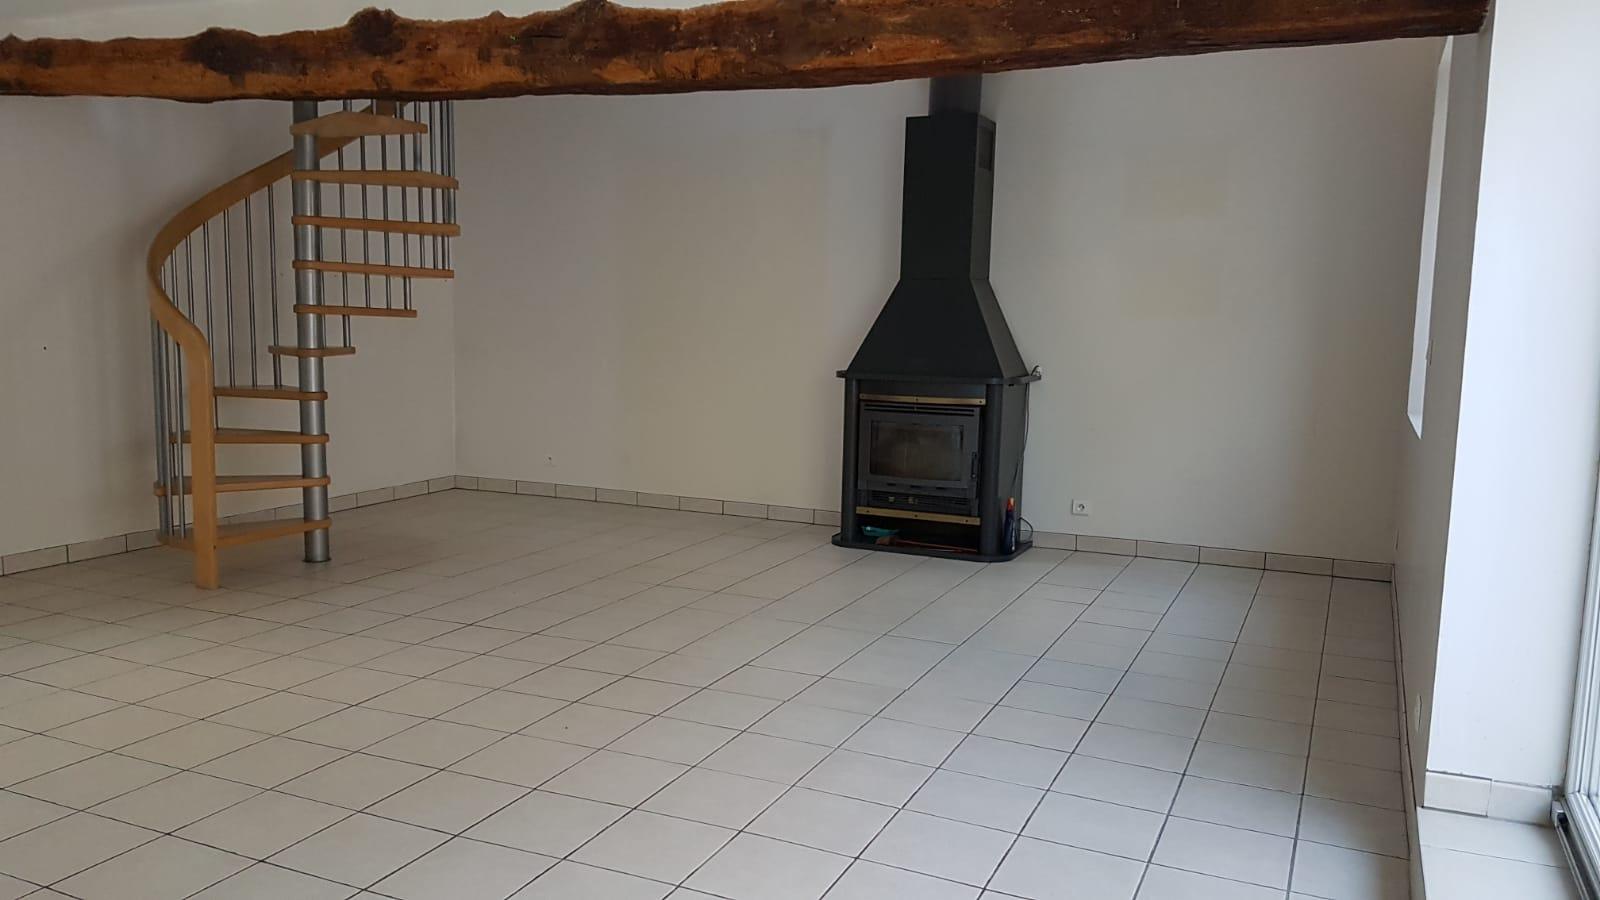 Salon-Salle à manger 37 m²